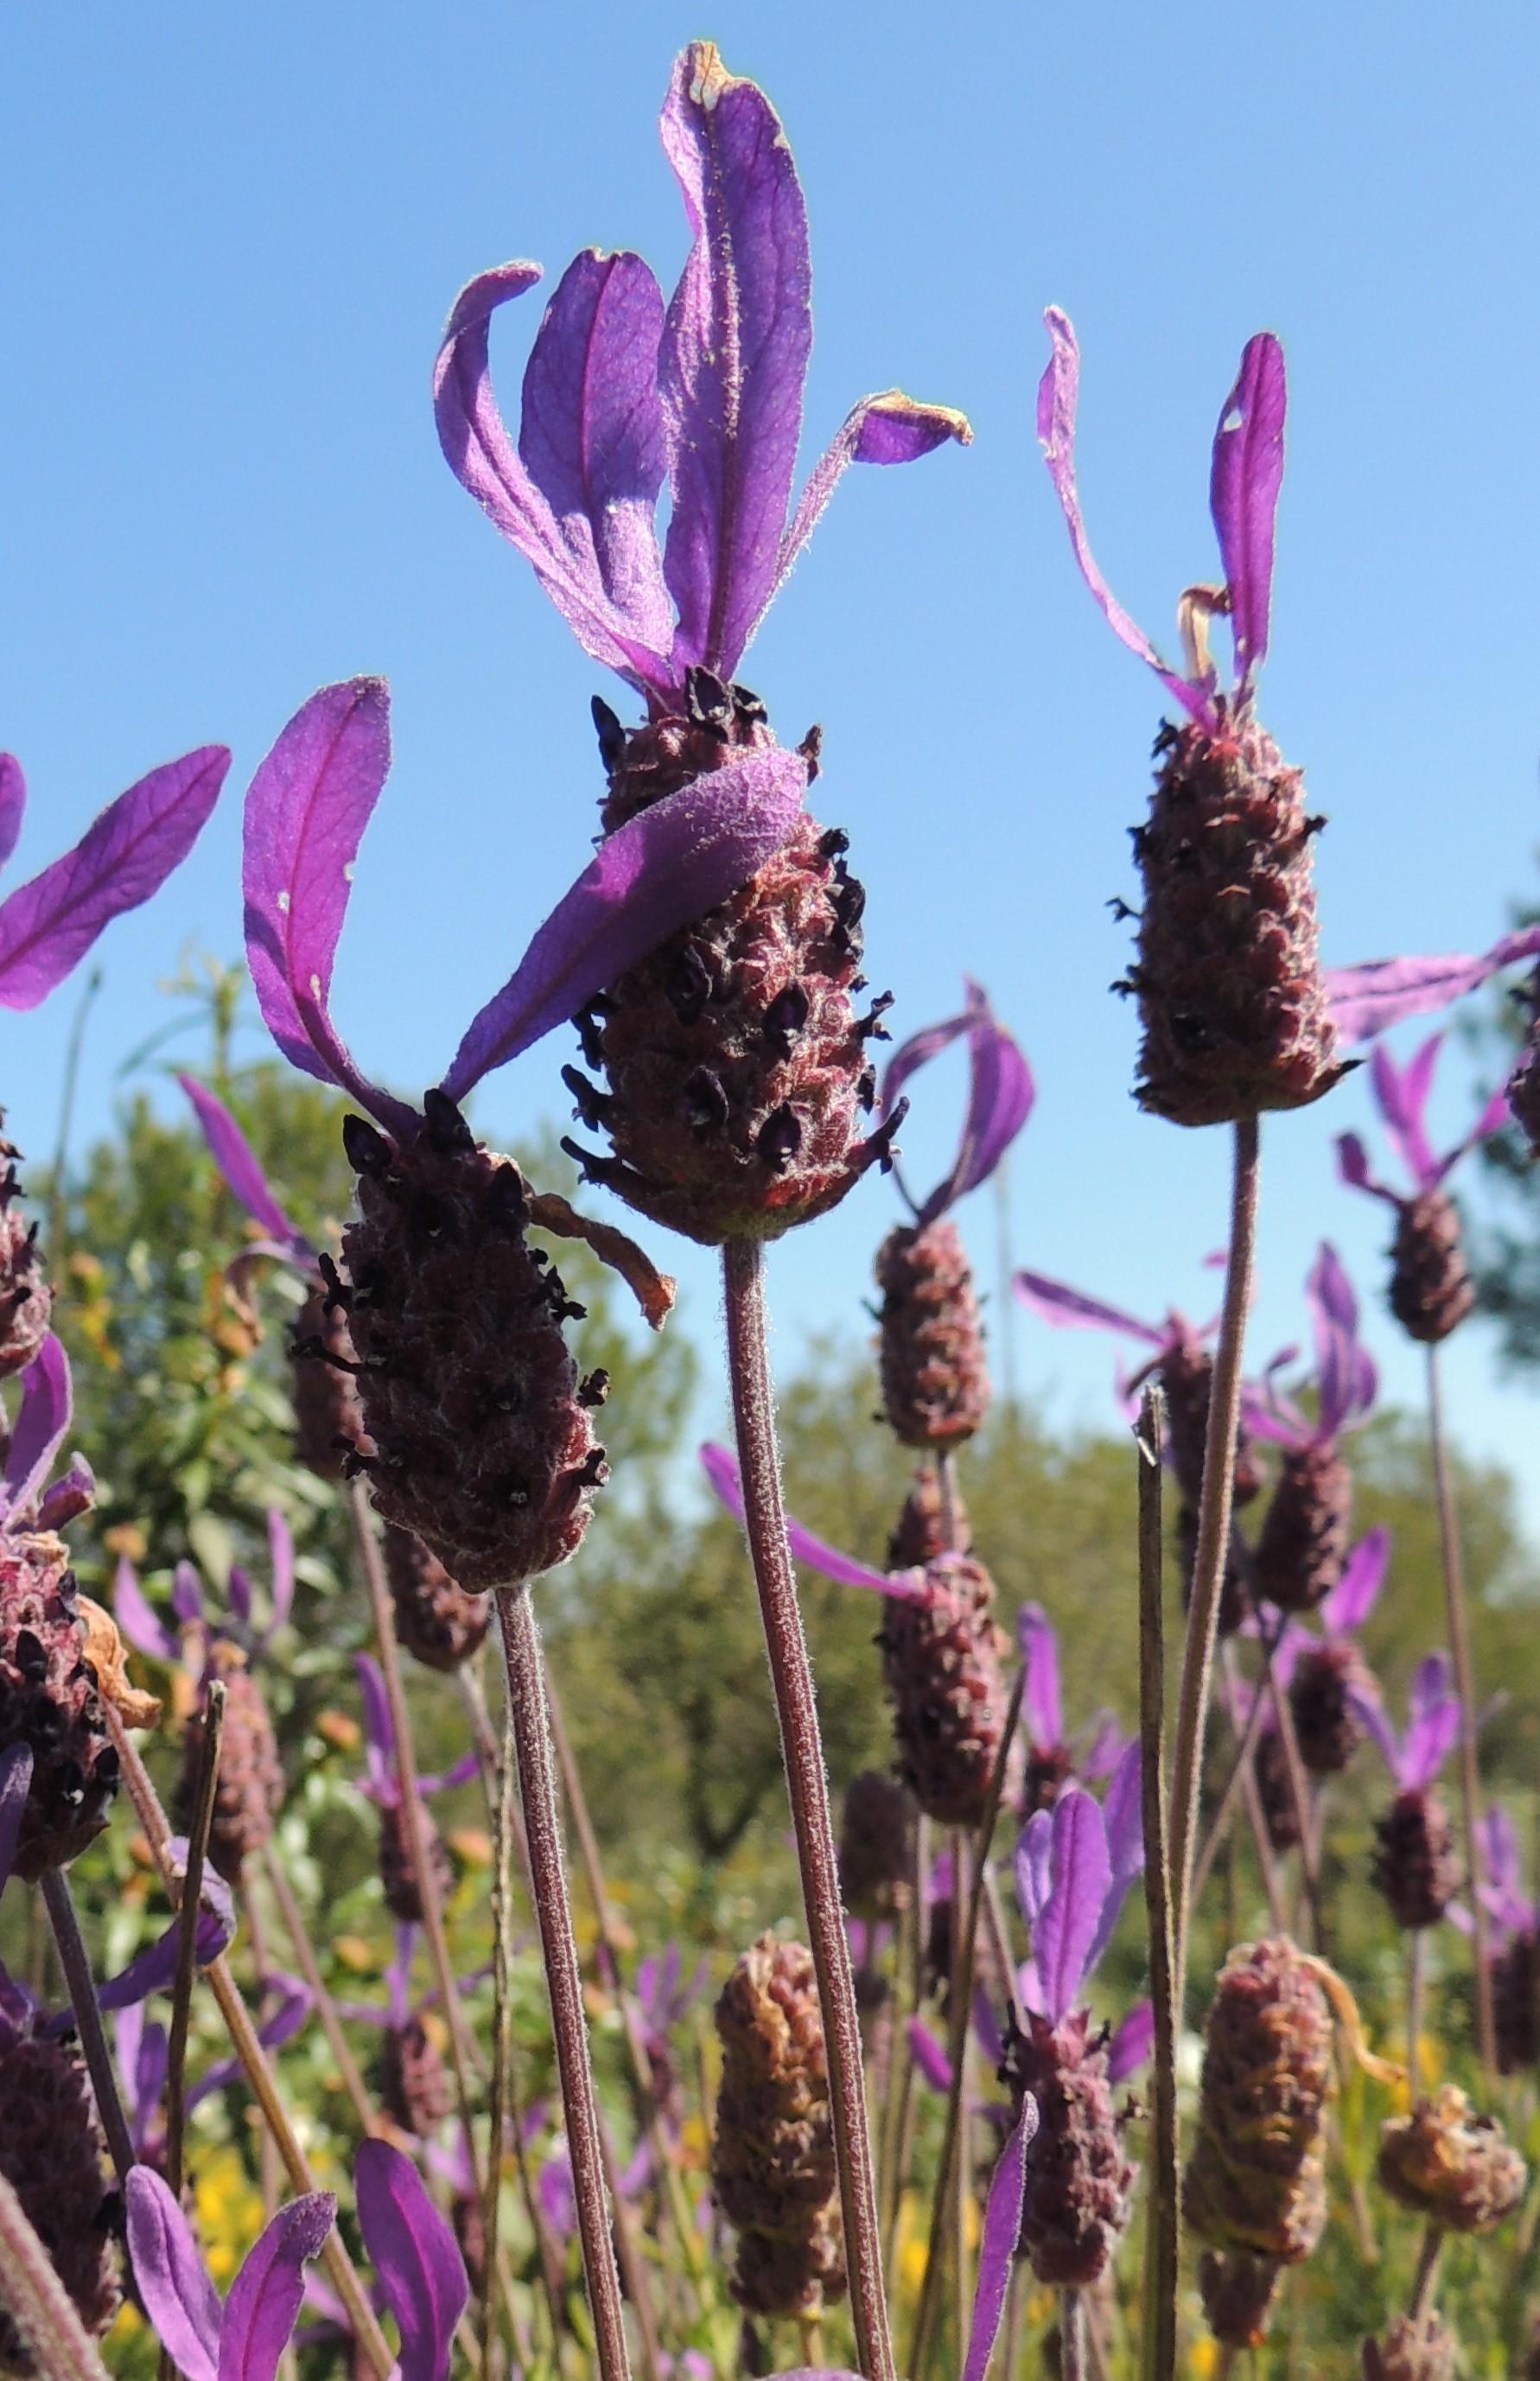 National Flower Of Portugal : national, flower, portugal, National-flower-of-portugal, Becky, Portugal